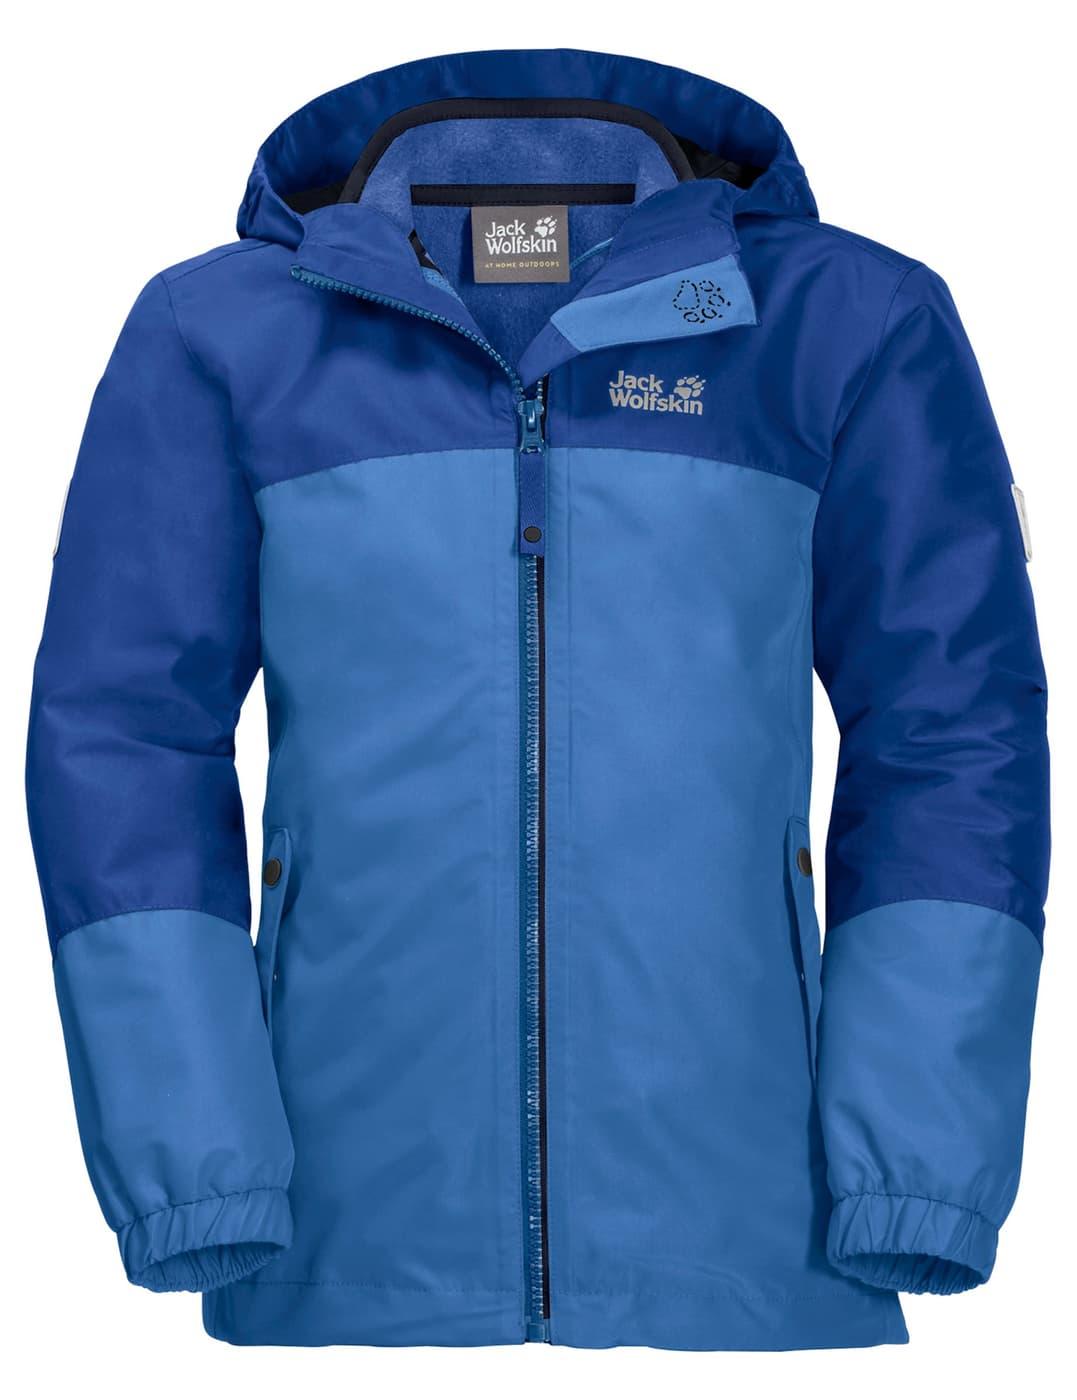 shades of best quality great prices Jack Wolfskin Iceland Trekking 3in1 Jacke